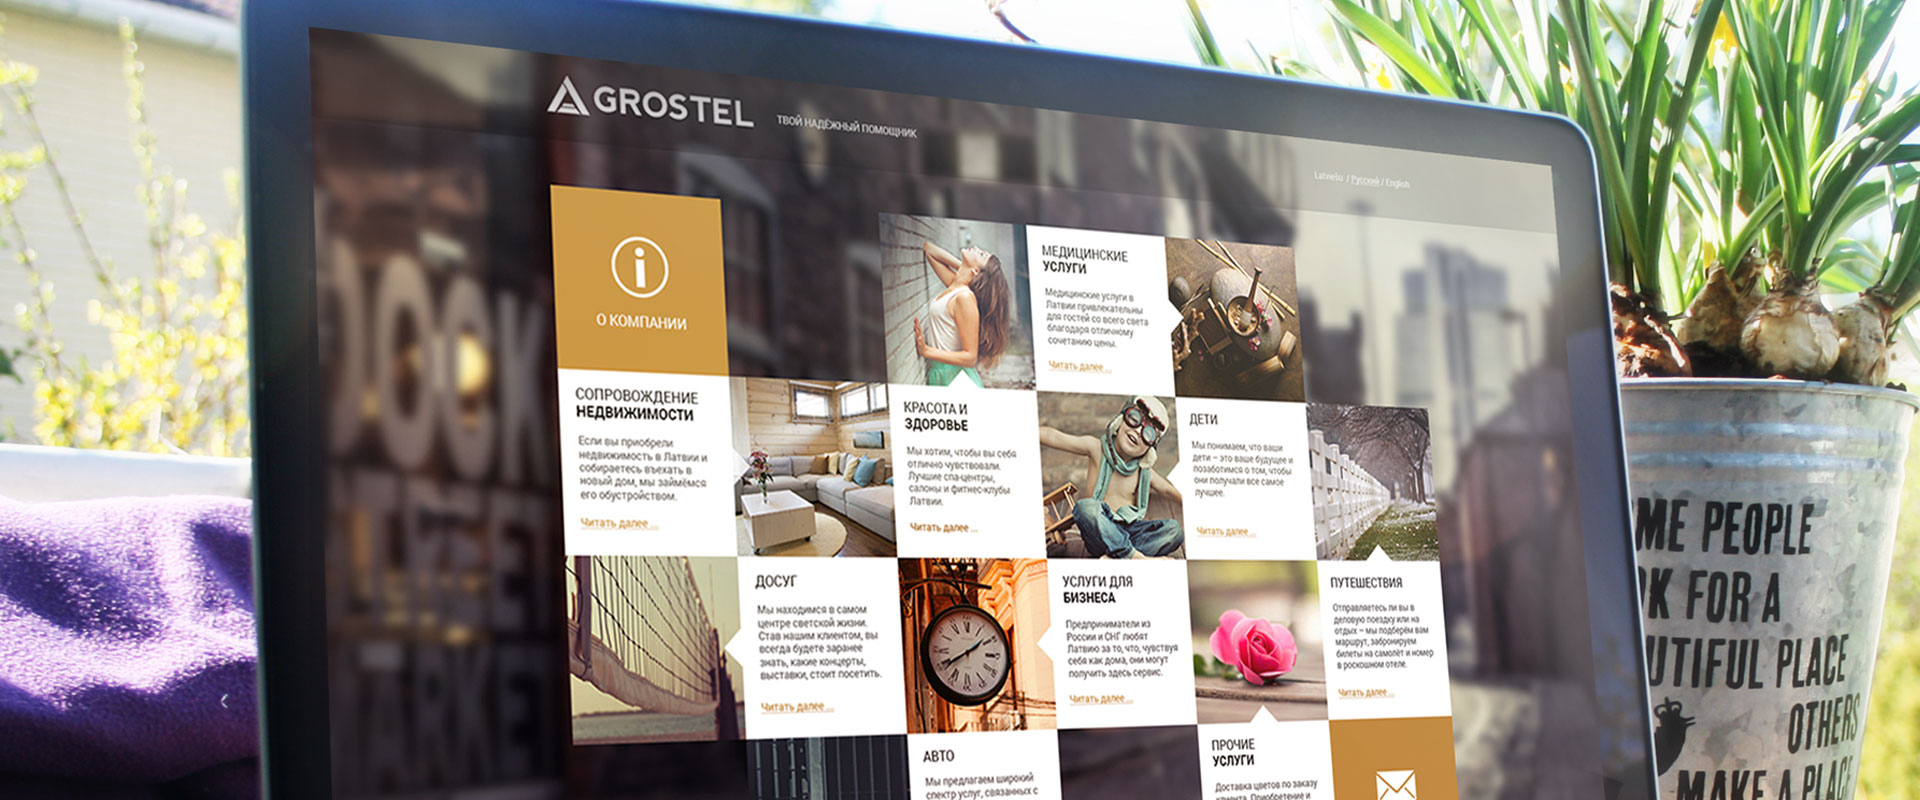 grostel-website-1